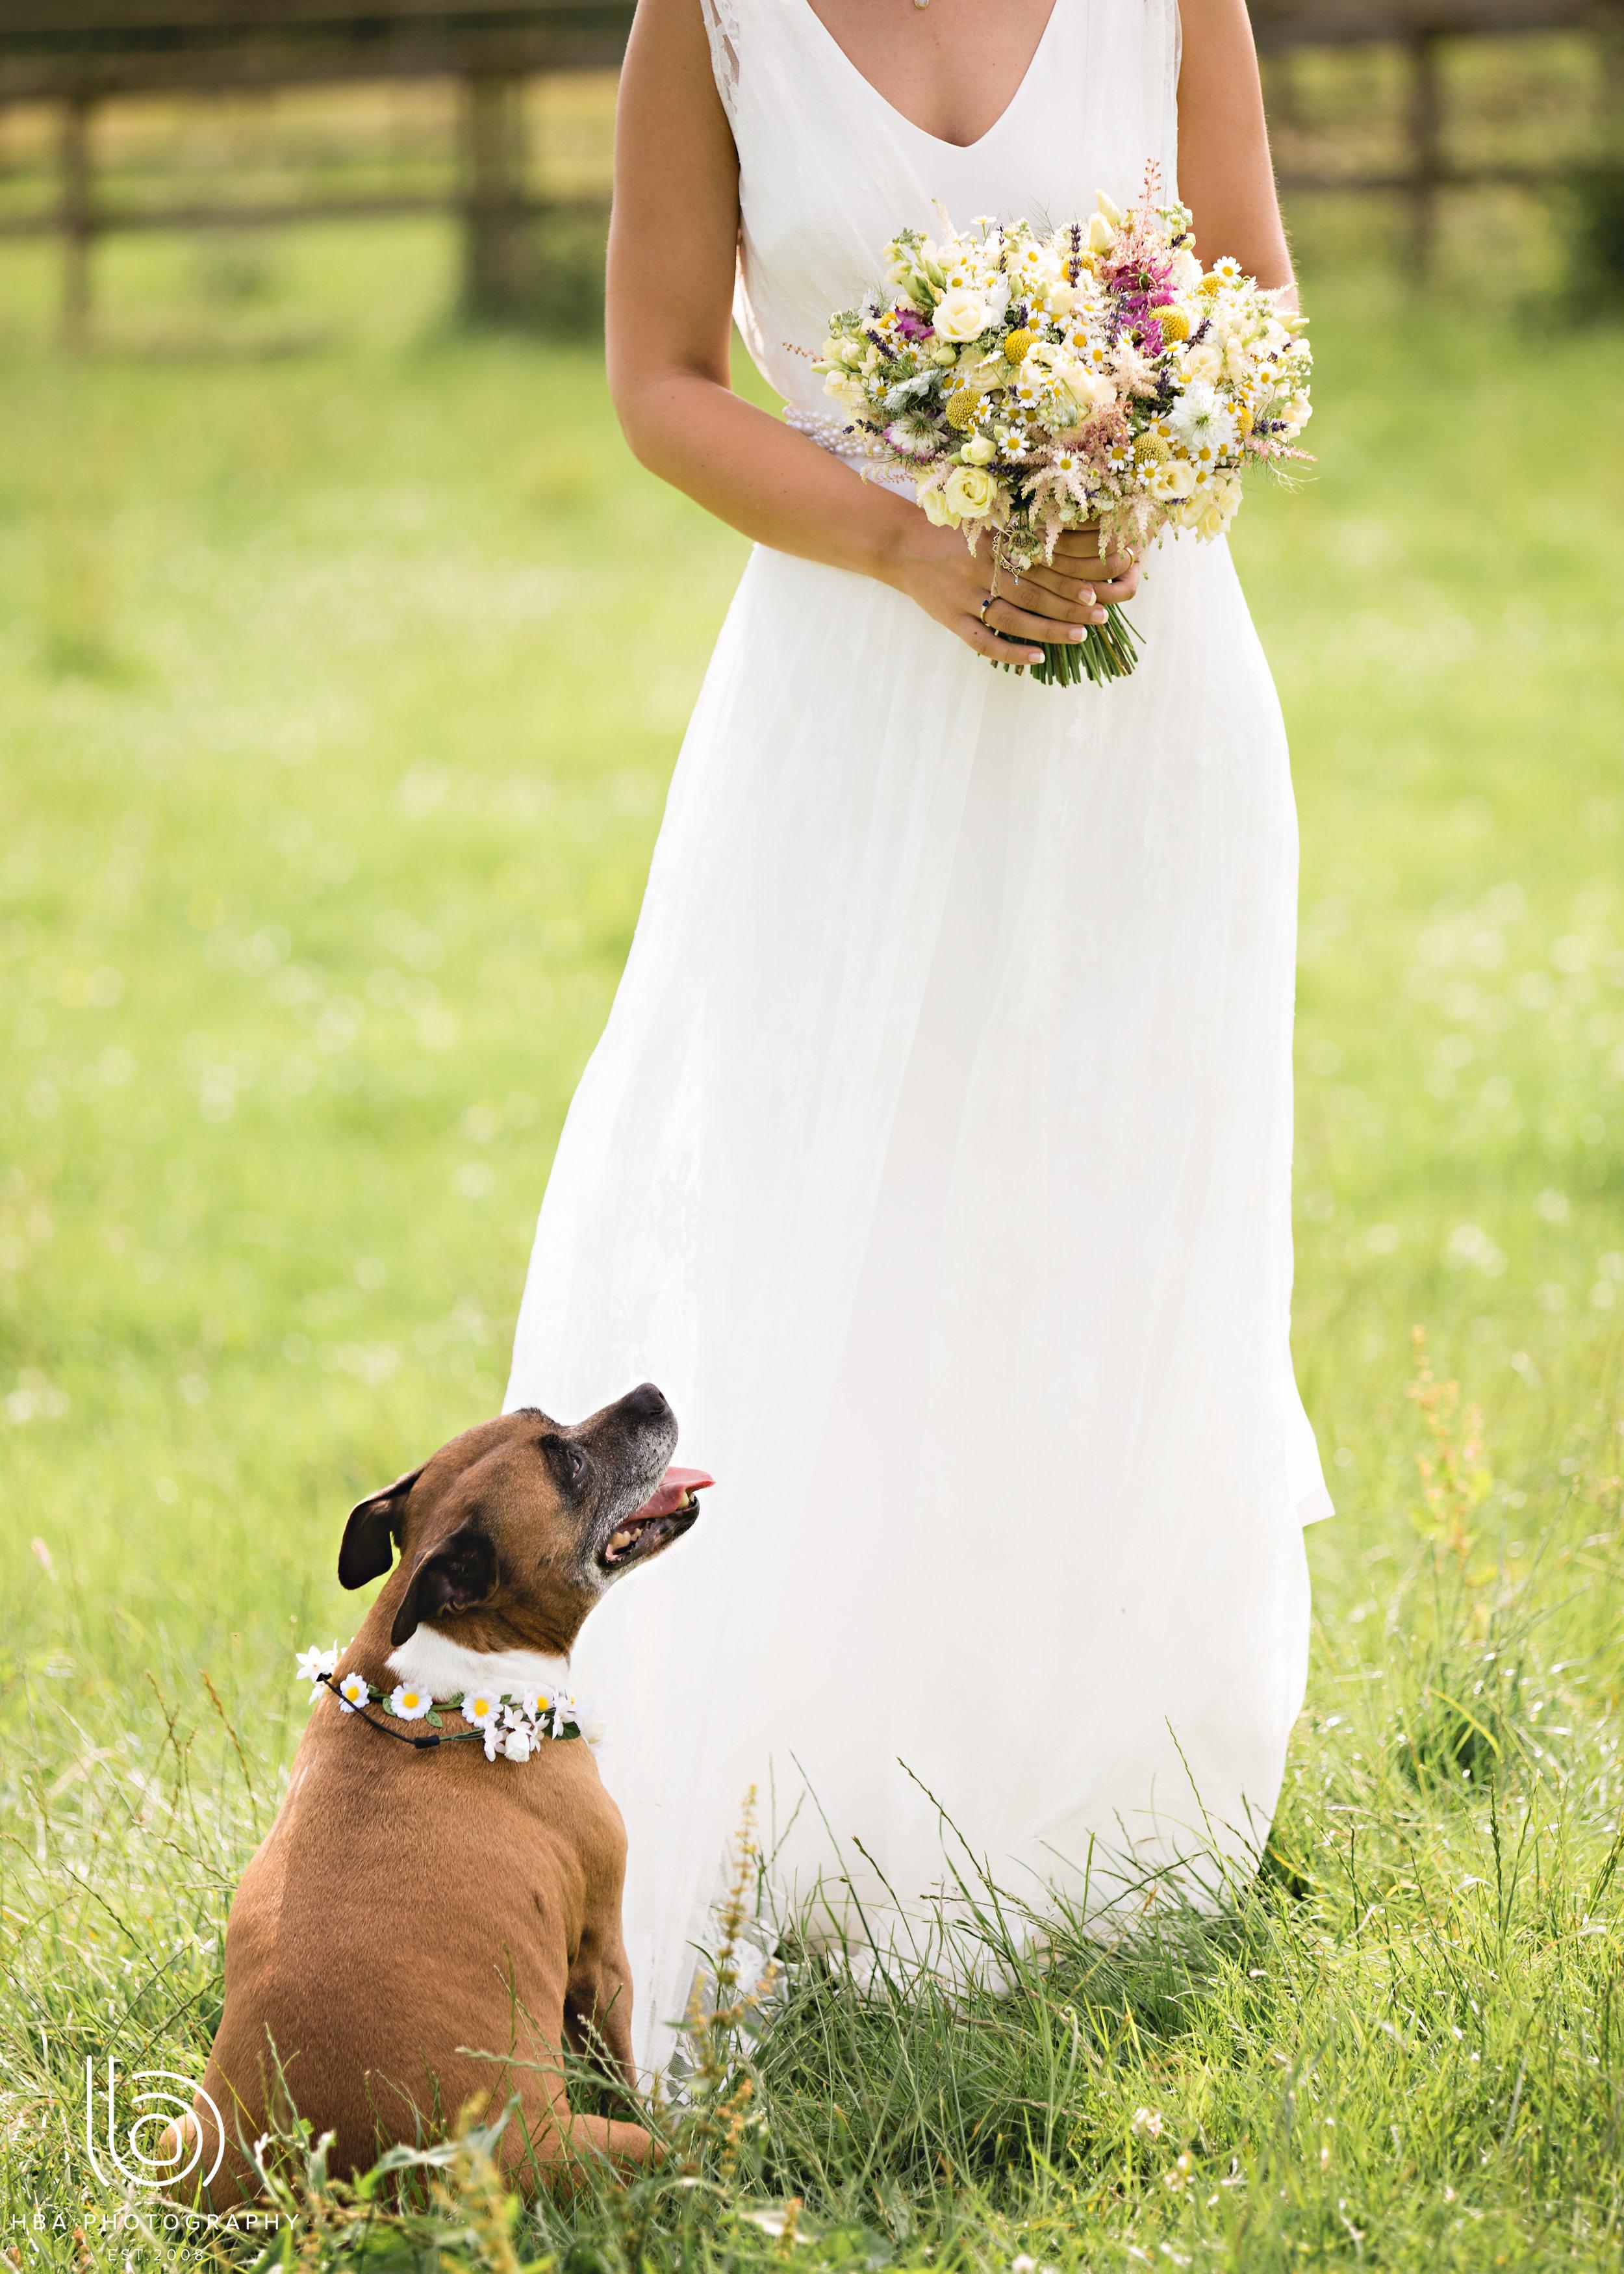 Simple and elegant rustic bridal flowers by Derbyshire Florist Tineke Floral Design in Derbyshire